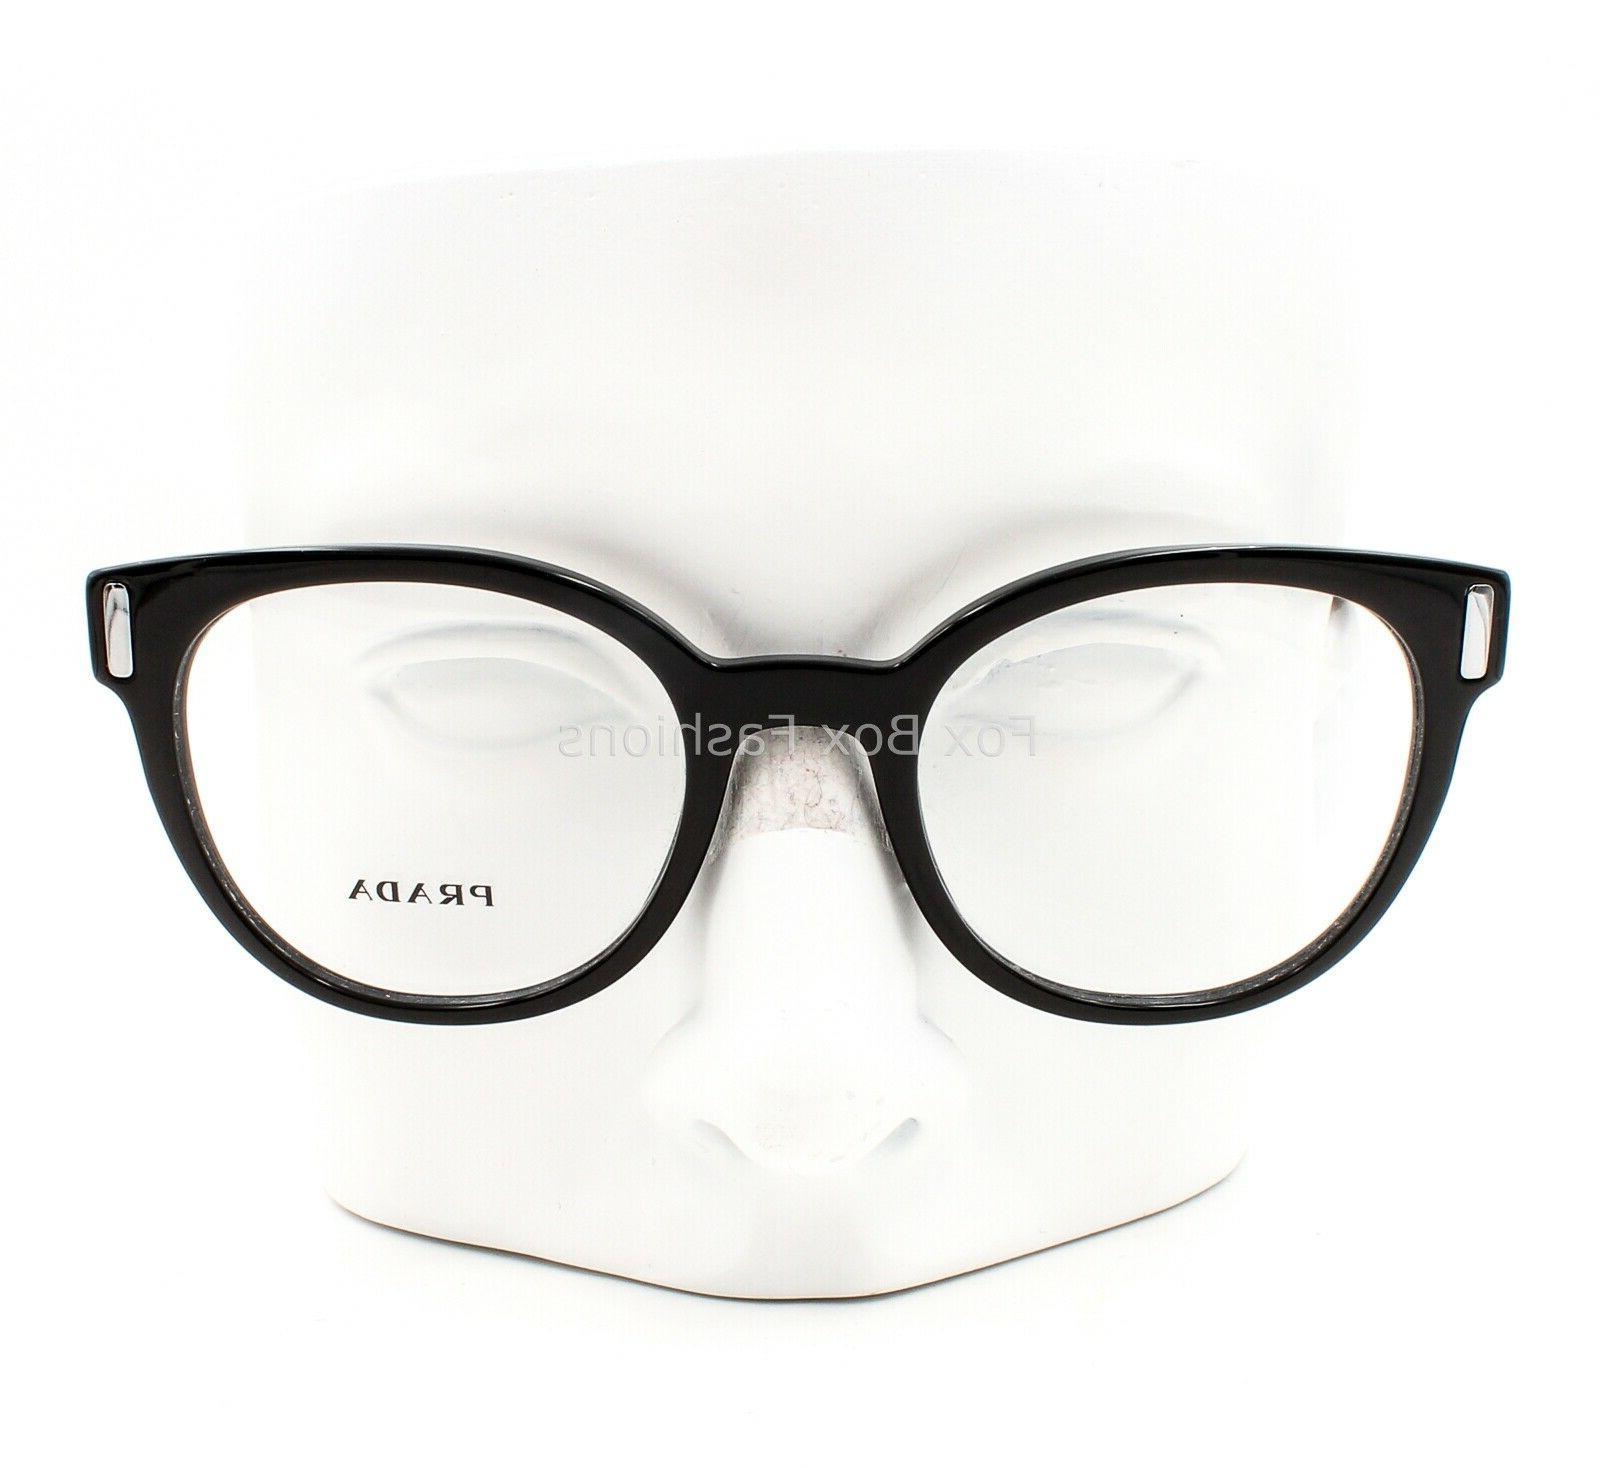 Prada Eyeglasses Black on Havana Size 50-20-135